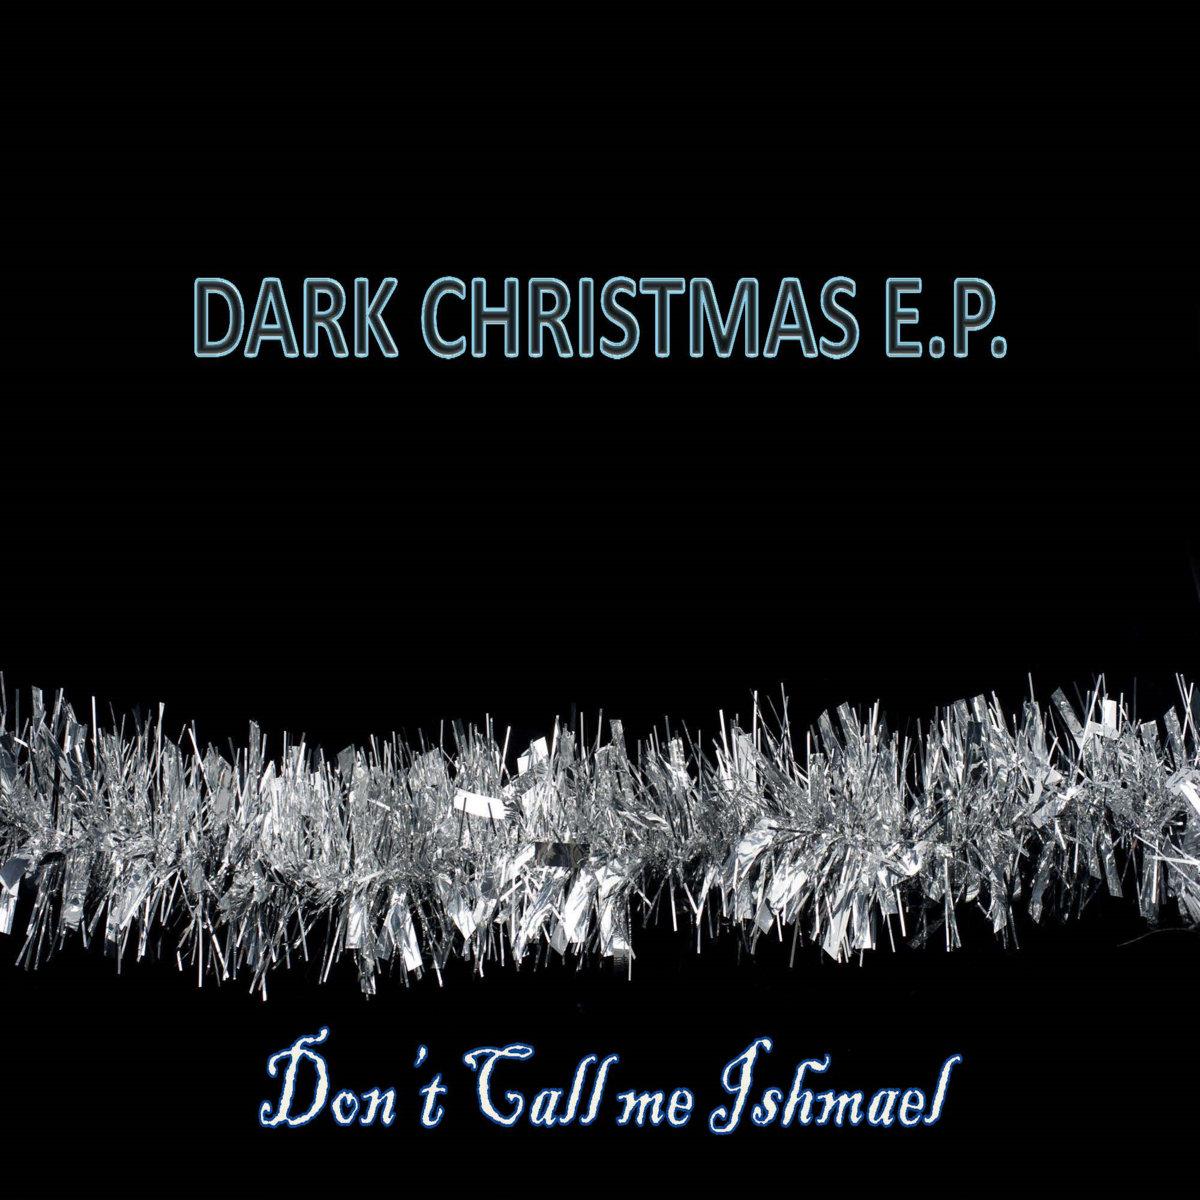 Don't Call me Ishmael Dark Christmas E.P.